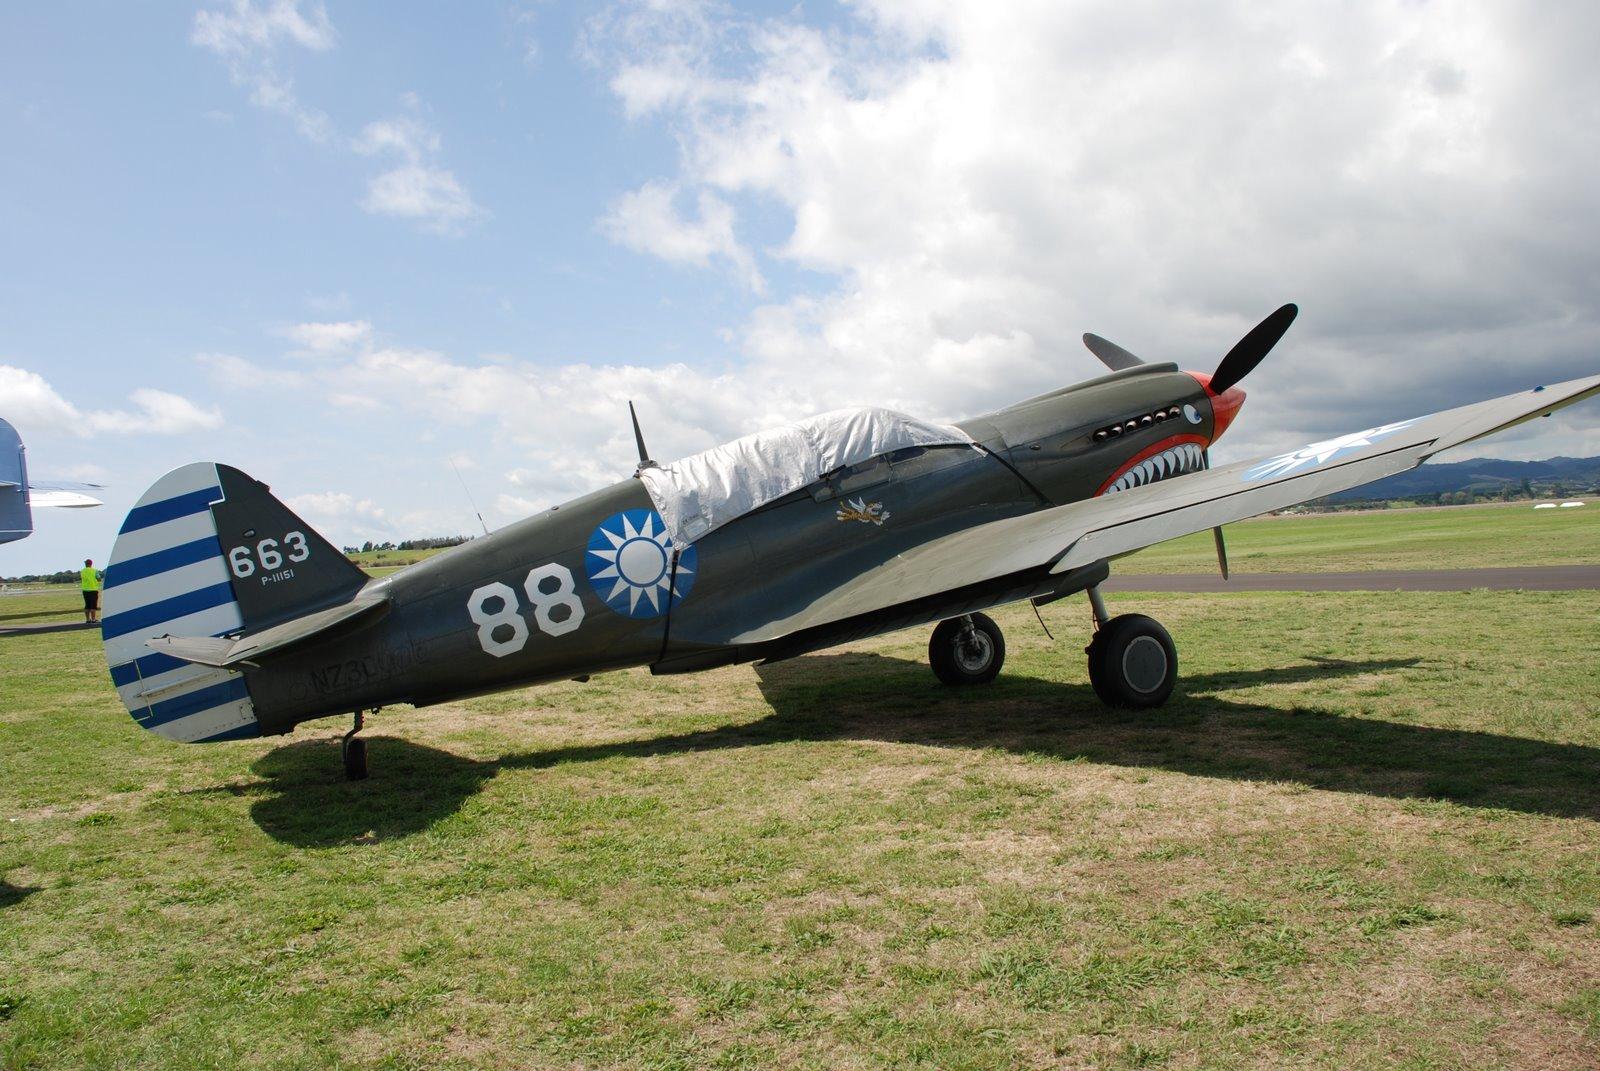 File:Curtiss P40-E Kittyhawk.jpg - Wikimedia Commons